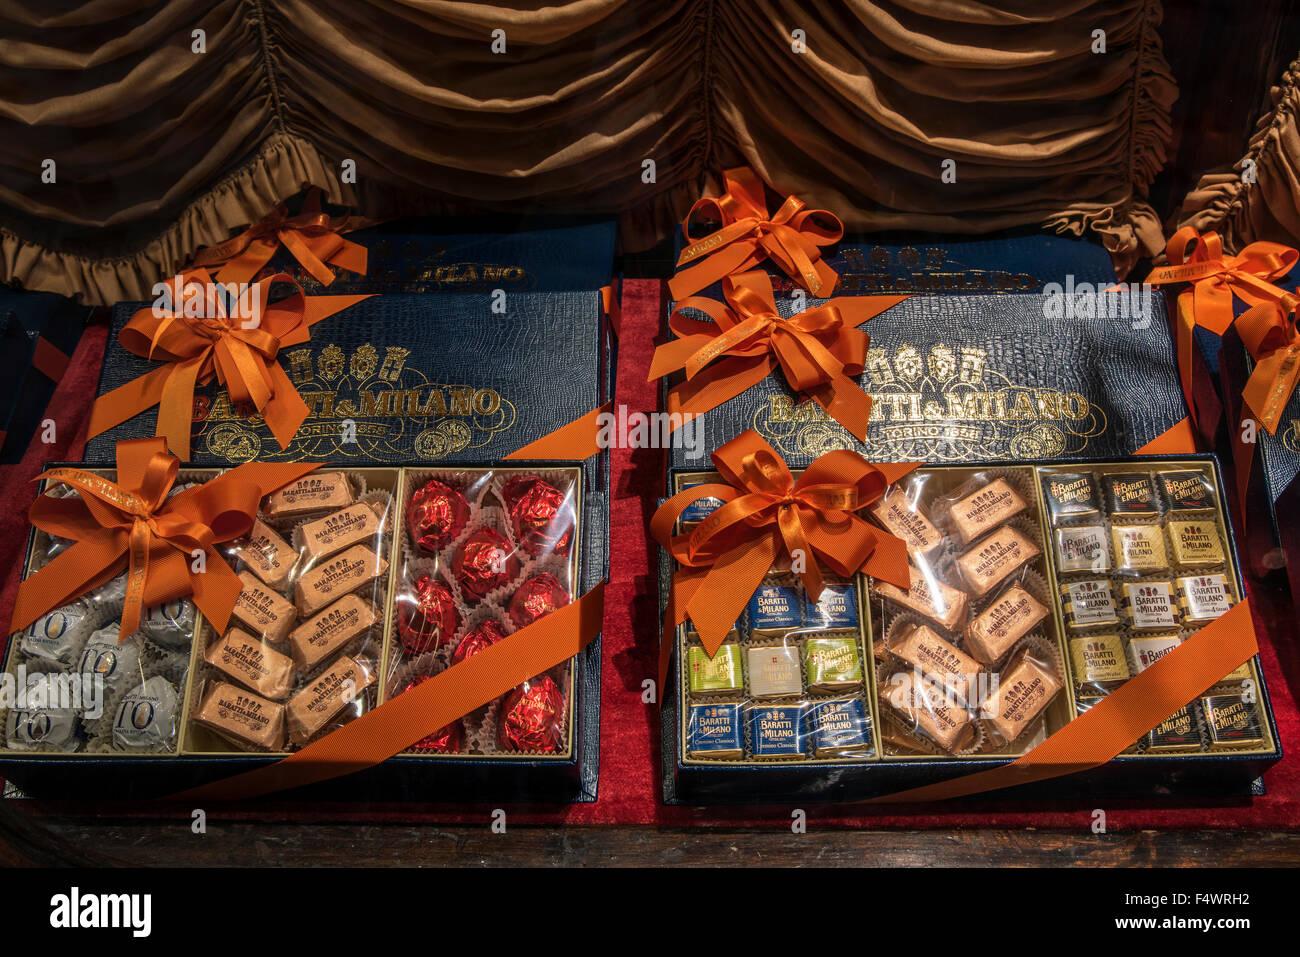 Boîtes cadeau chocolat en vente au Caffe Baratti & Milano chocolat et café, Turin, Piémont, Italie Photo Stock